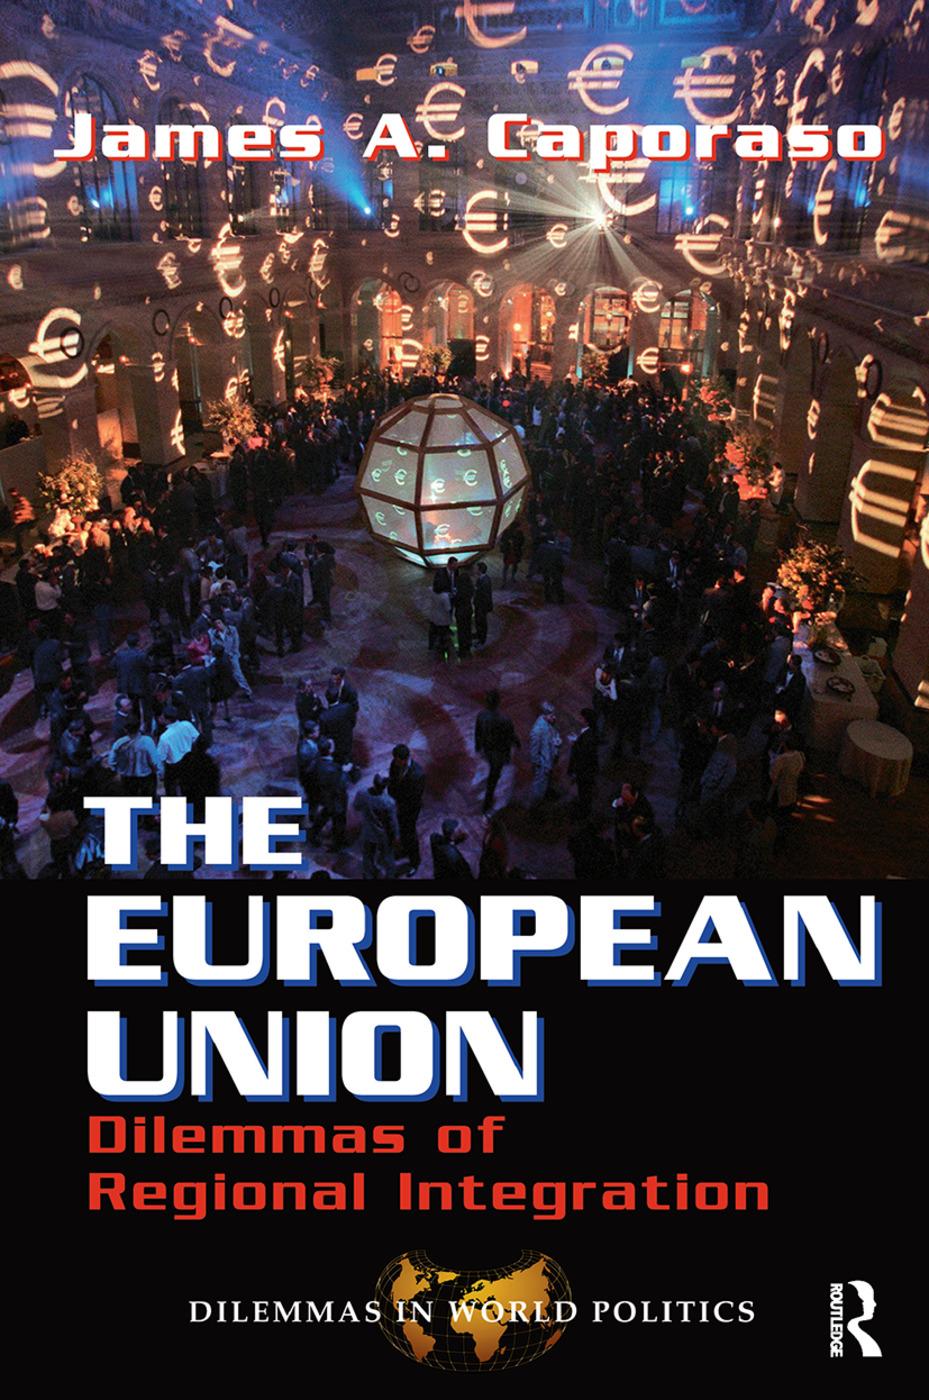 The European Union: Dilemmas Of Regional Integration book cover